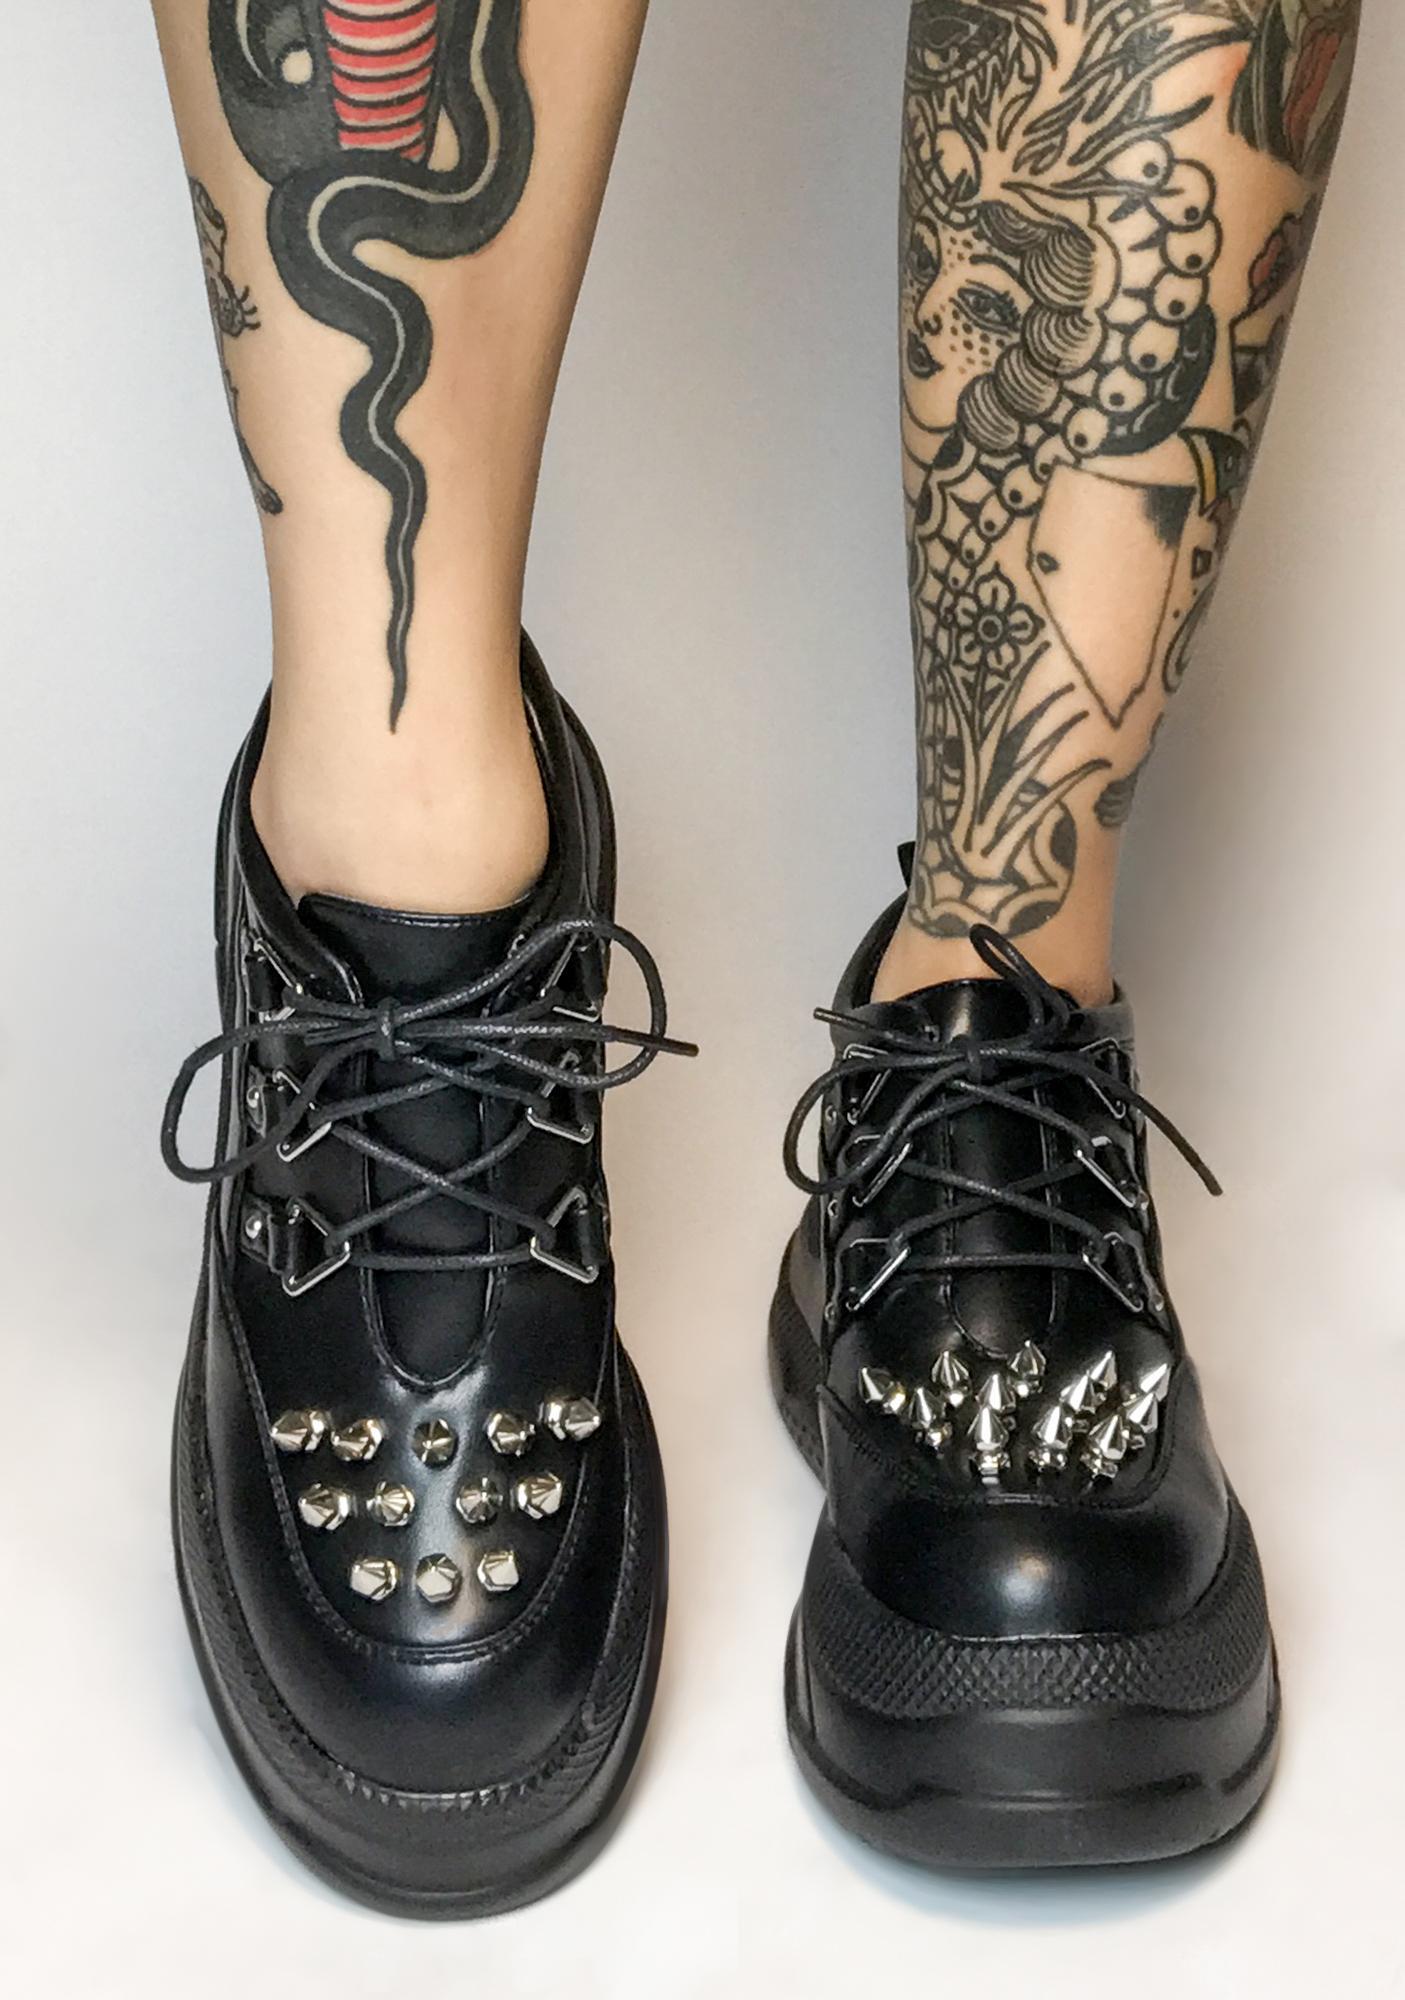 Lamoda Causin' Havoc Spiked Sneakers